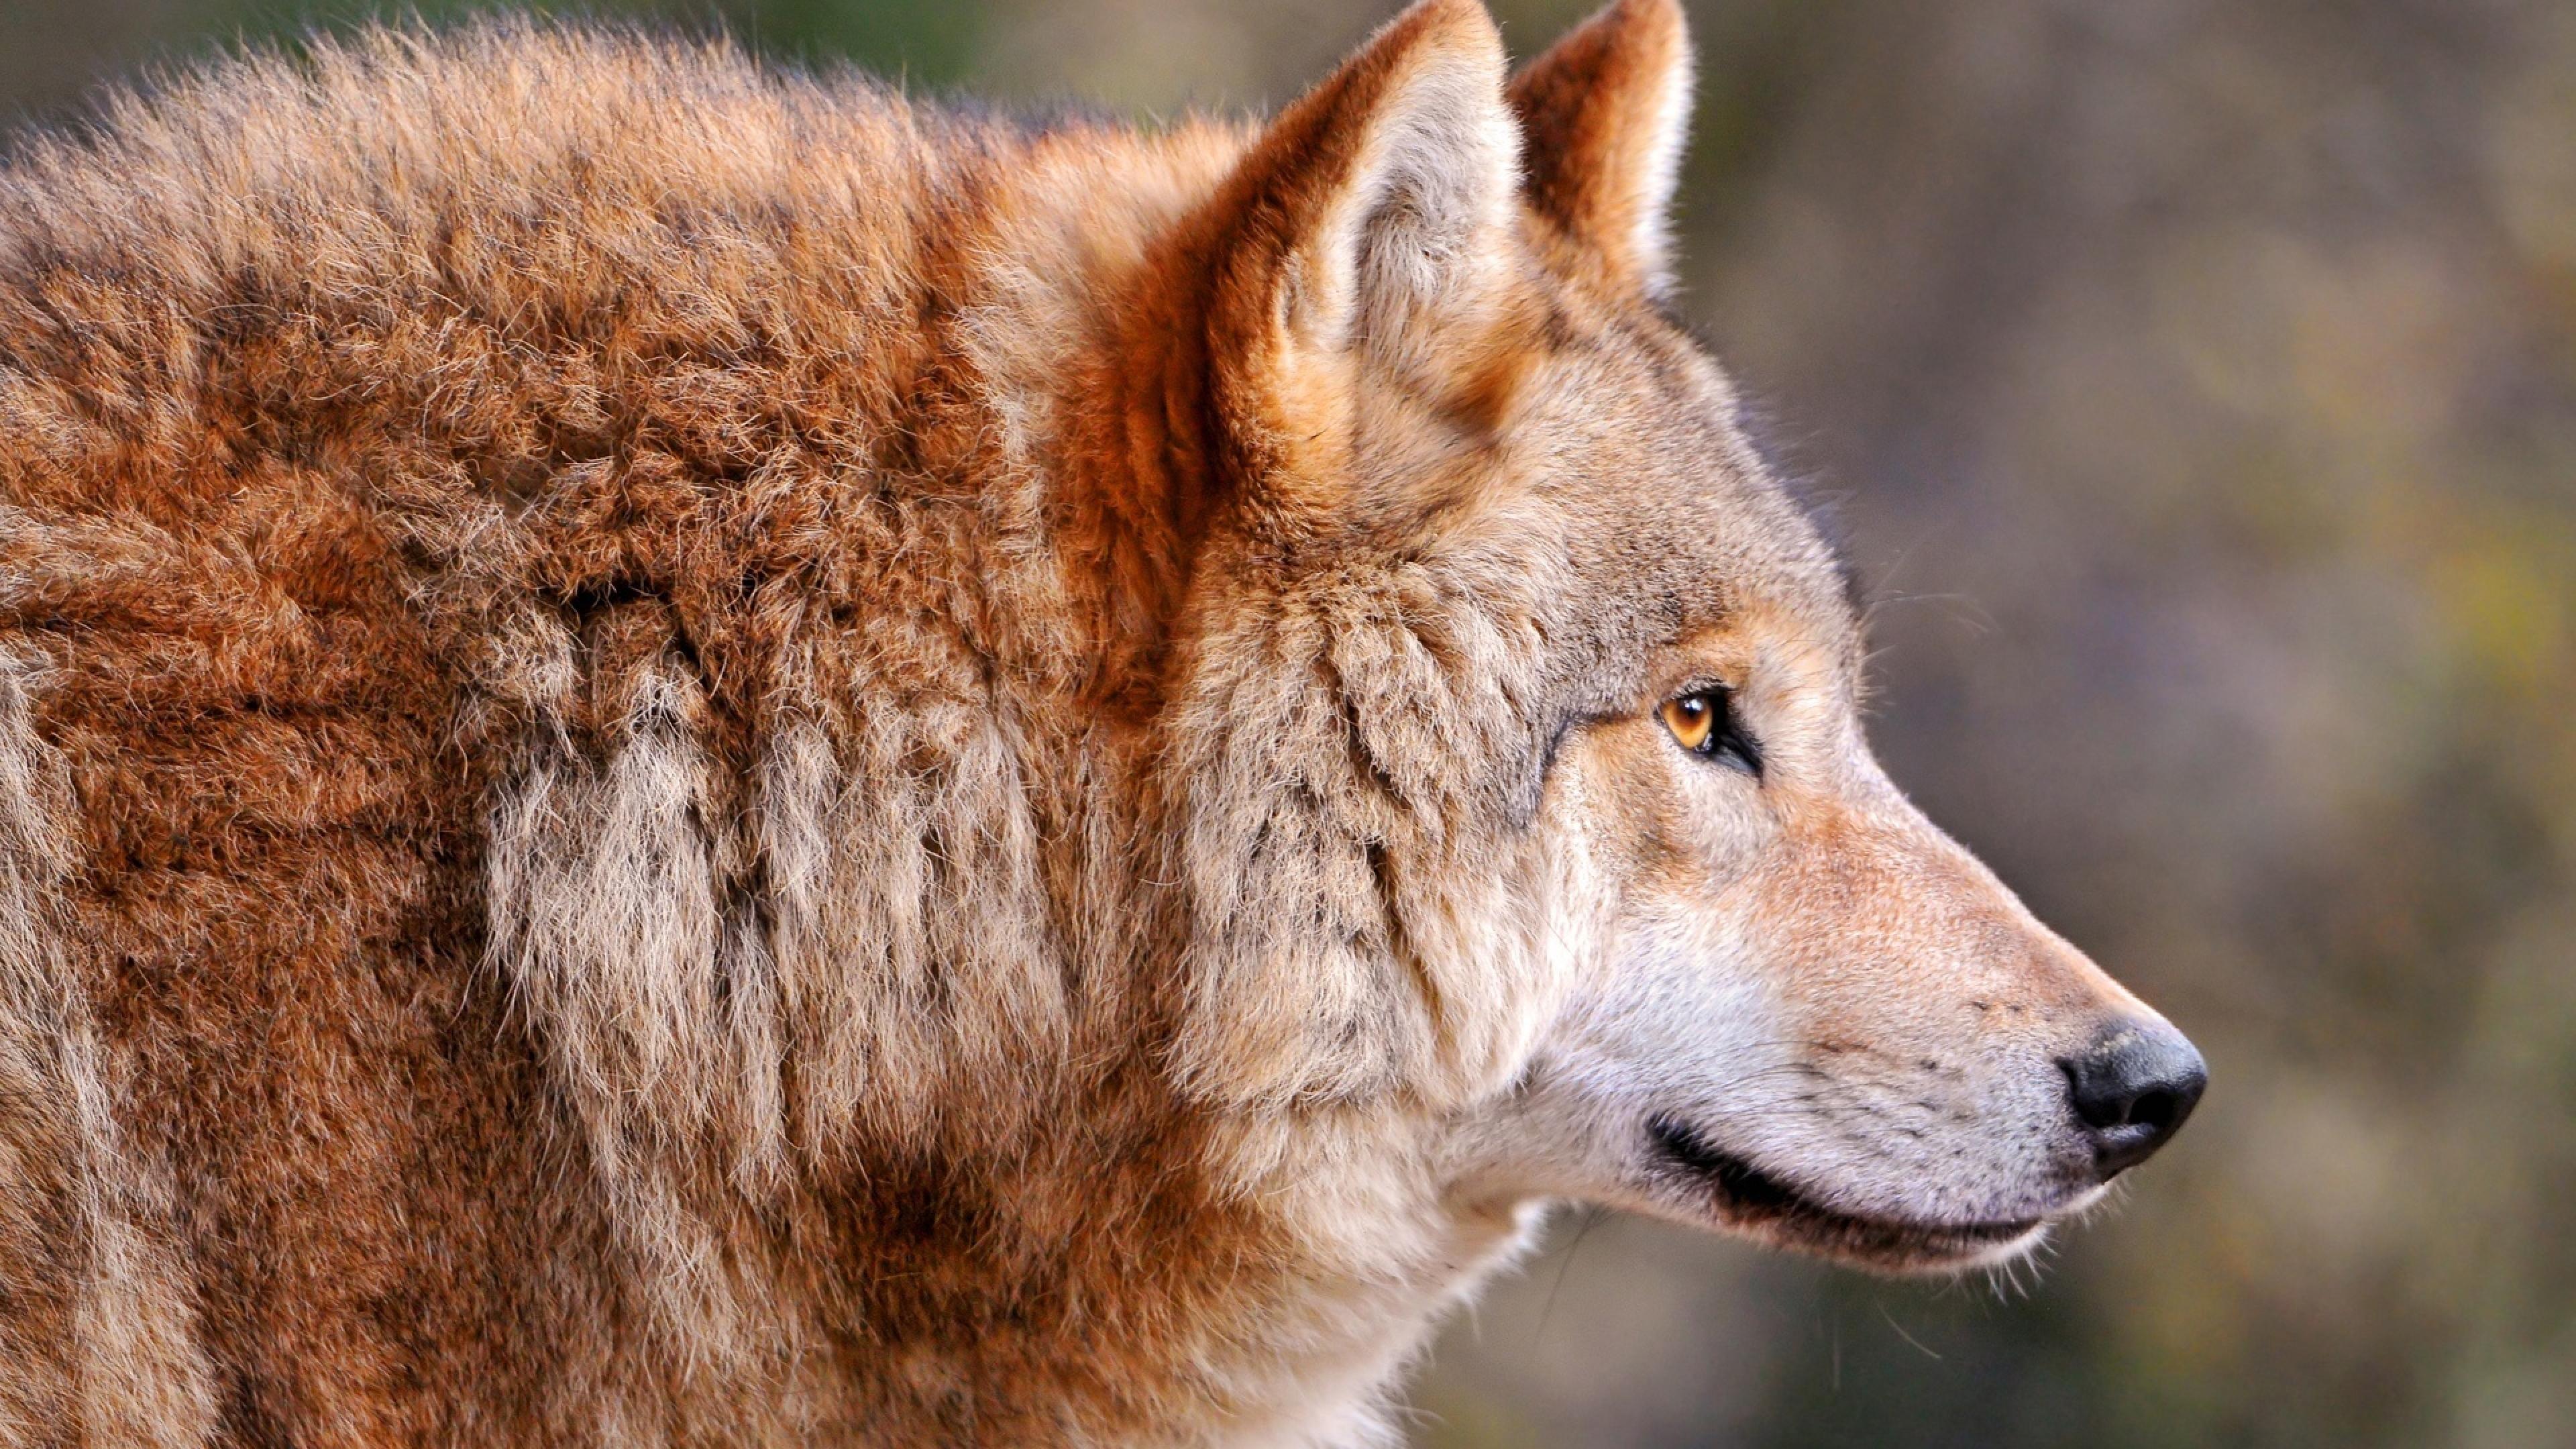 Download Wallpaper 3840x2160 wolf predator muzzle profile view 4K 3840x2160